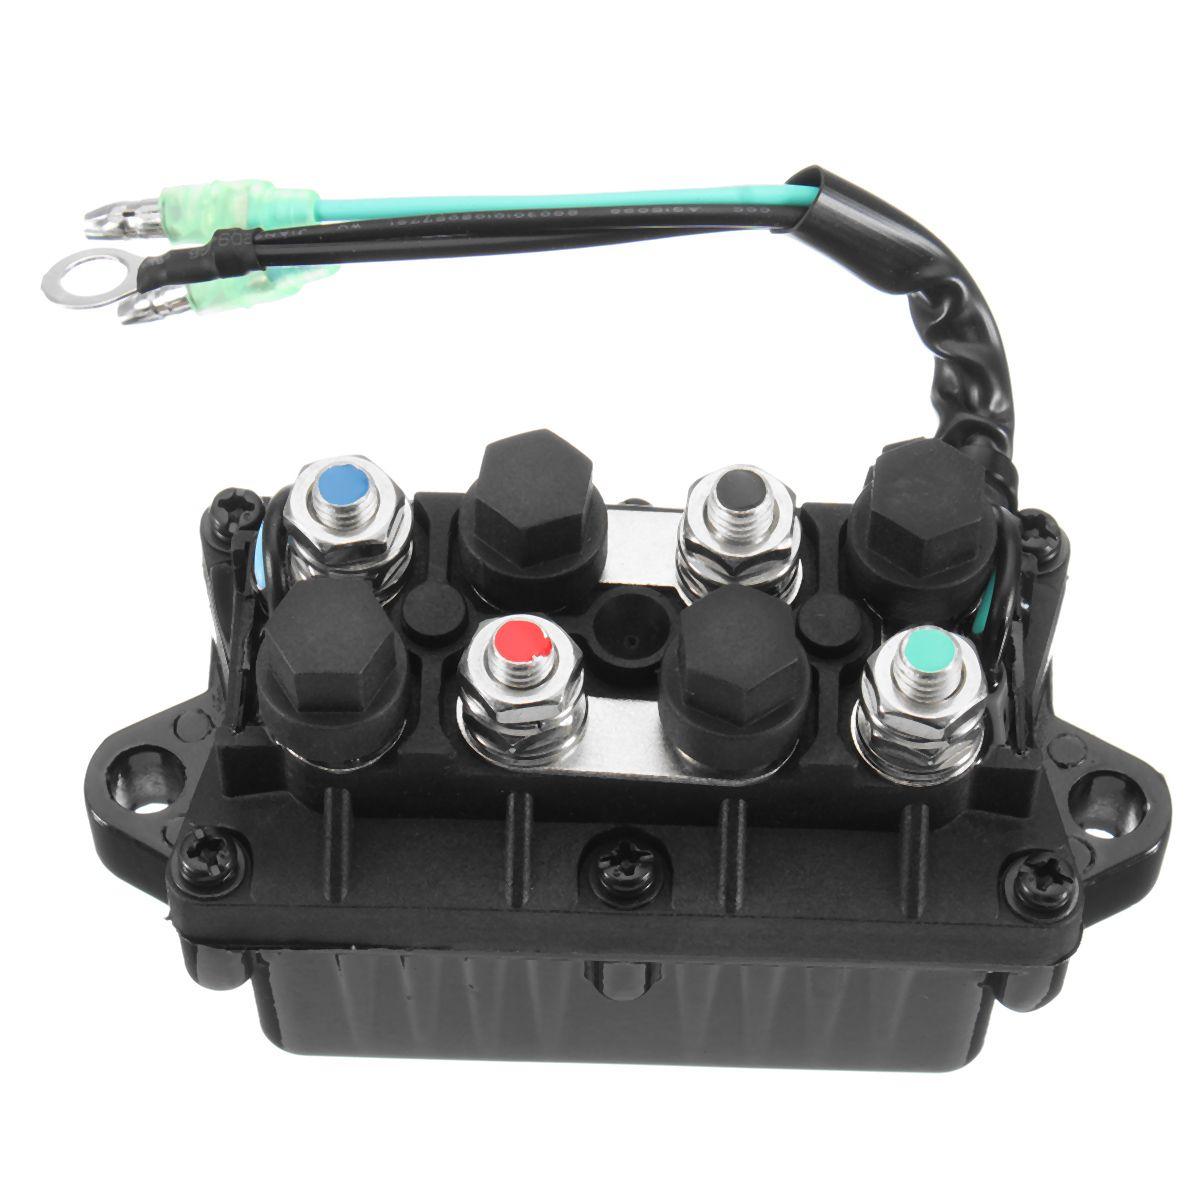 Boat Motor Power Trim Relay for Yamaha 30-90HP 6H1-81950-00-00 Engine 3 Pin 12V+-20% 120A Waterproof Aluminum Bronze+Plastic